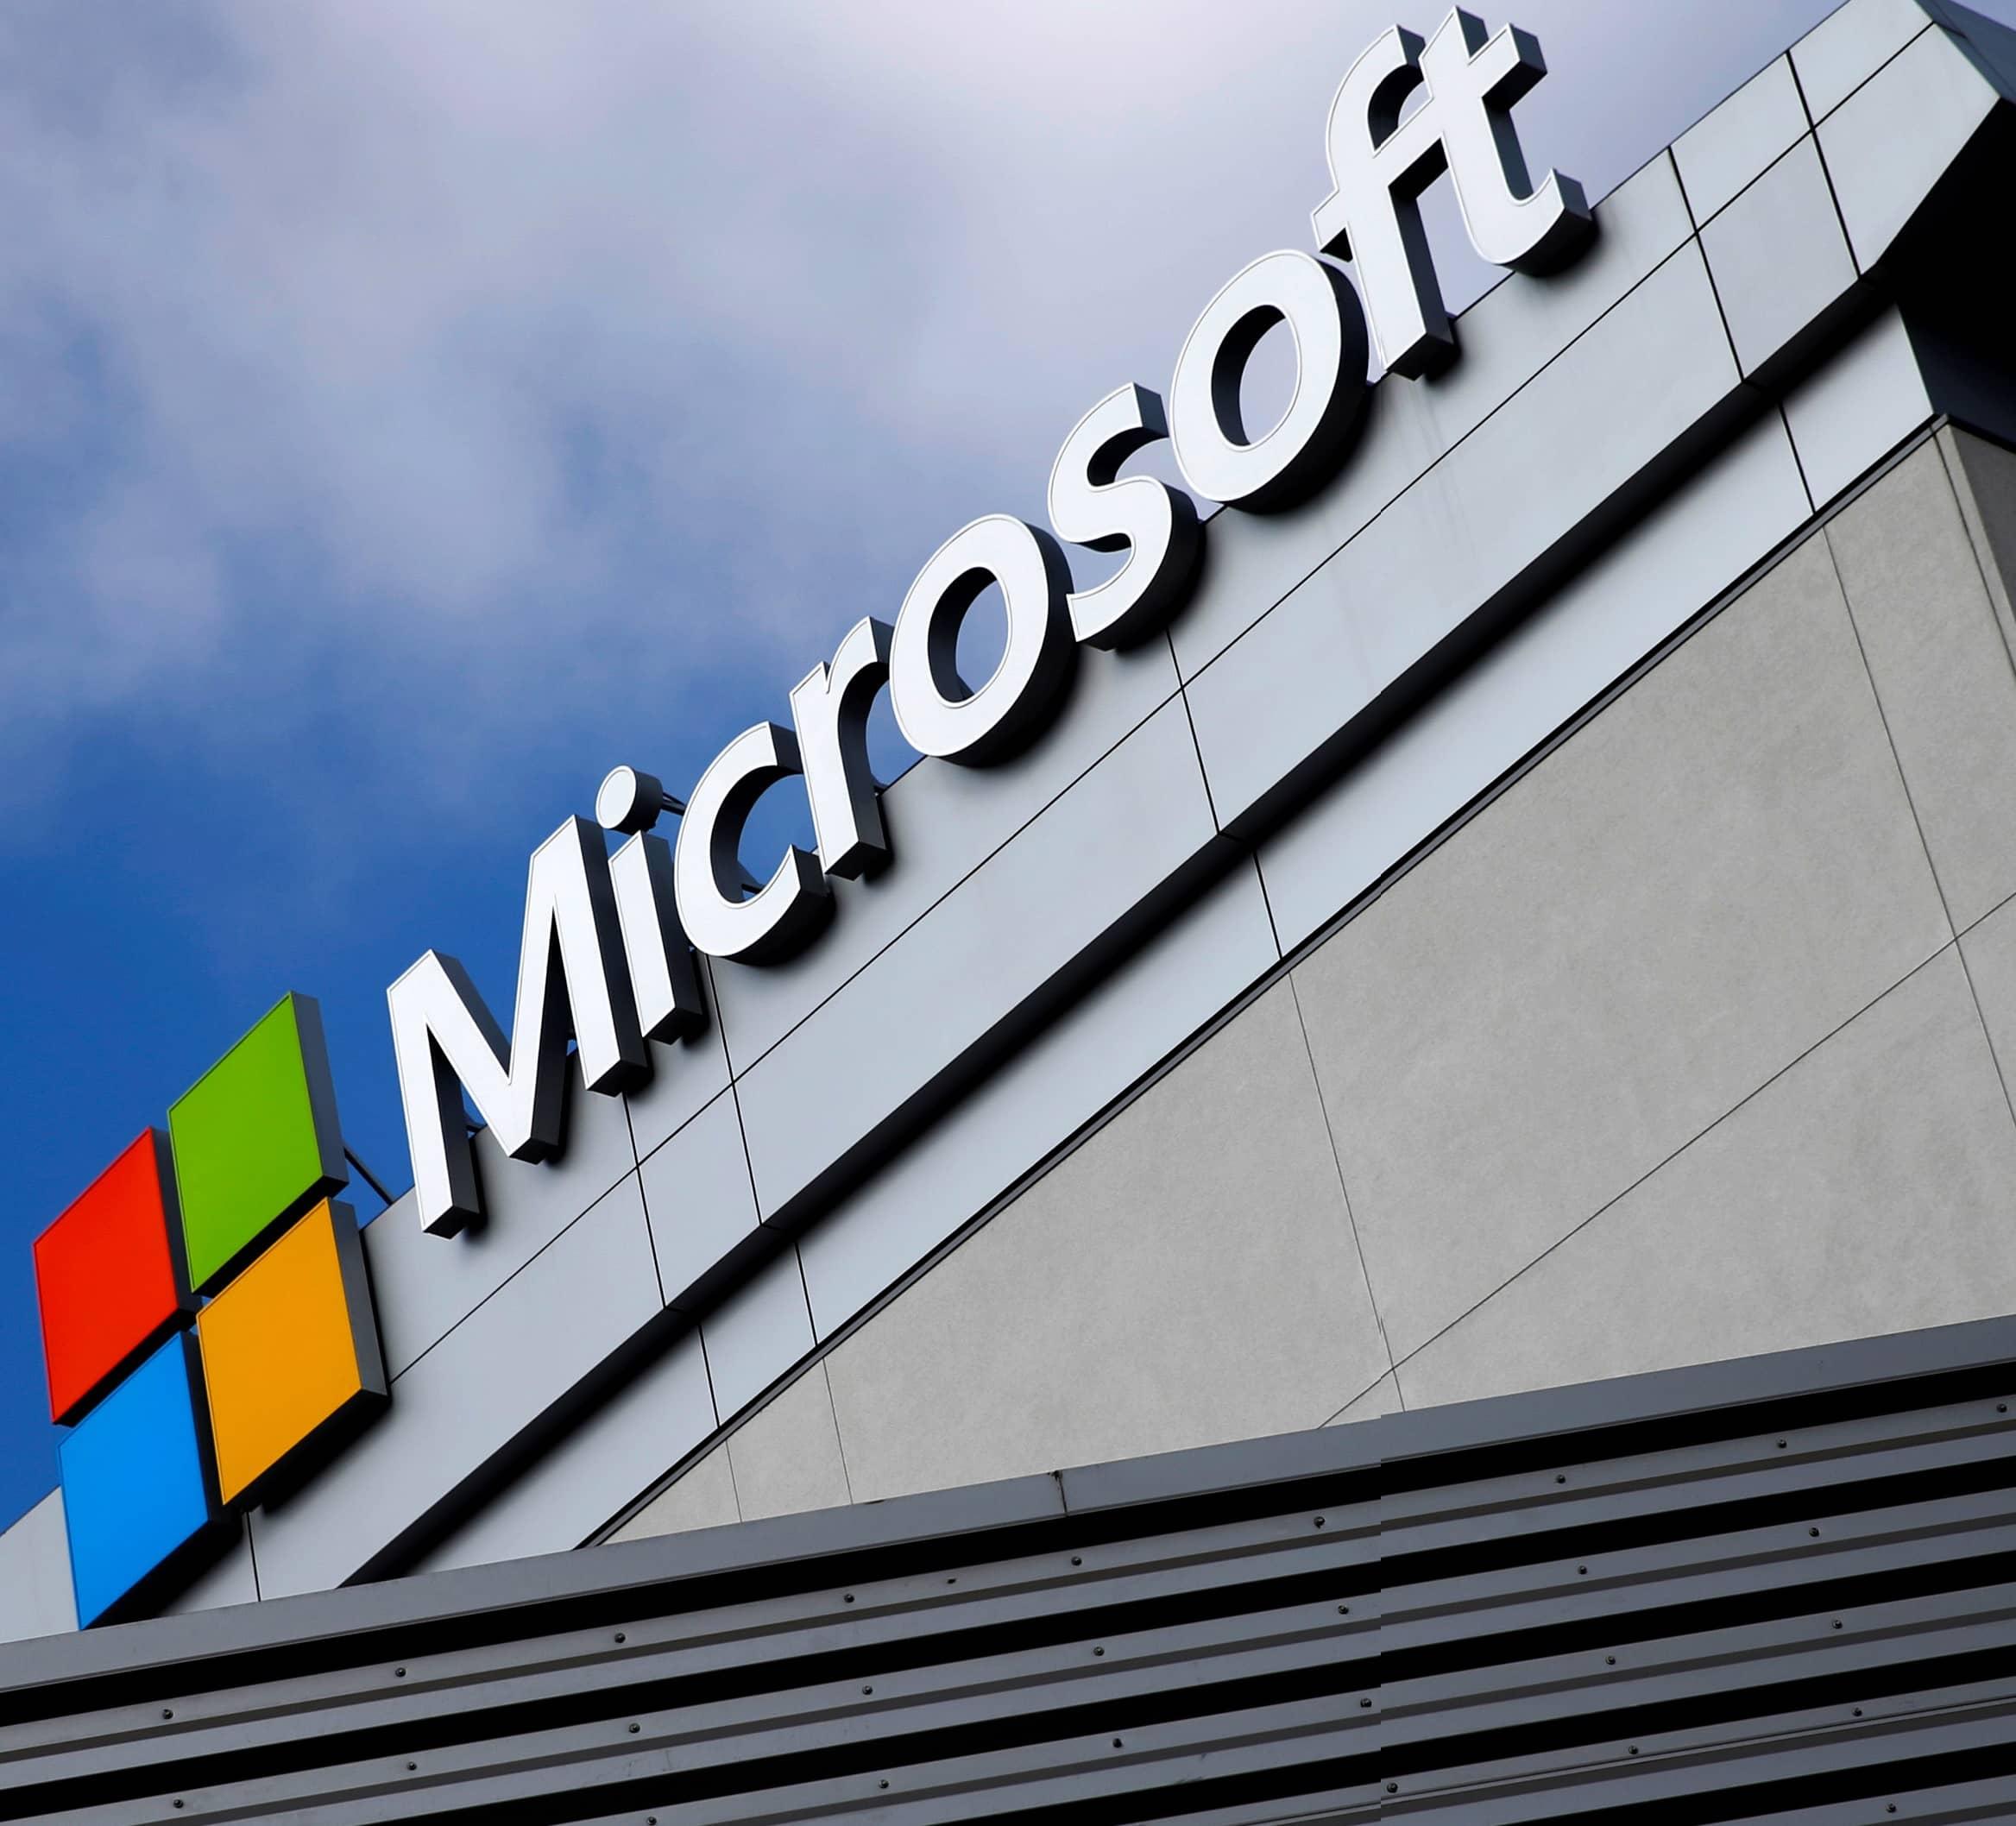 MICROSOFT'S TECHNOLOGY CHIEF PIVOTS TO PANDEMIC RESPONSE